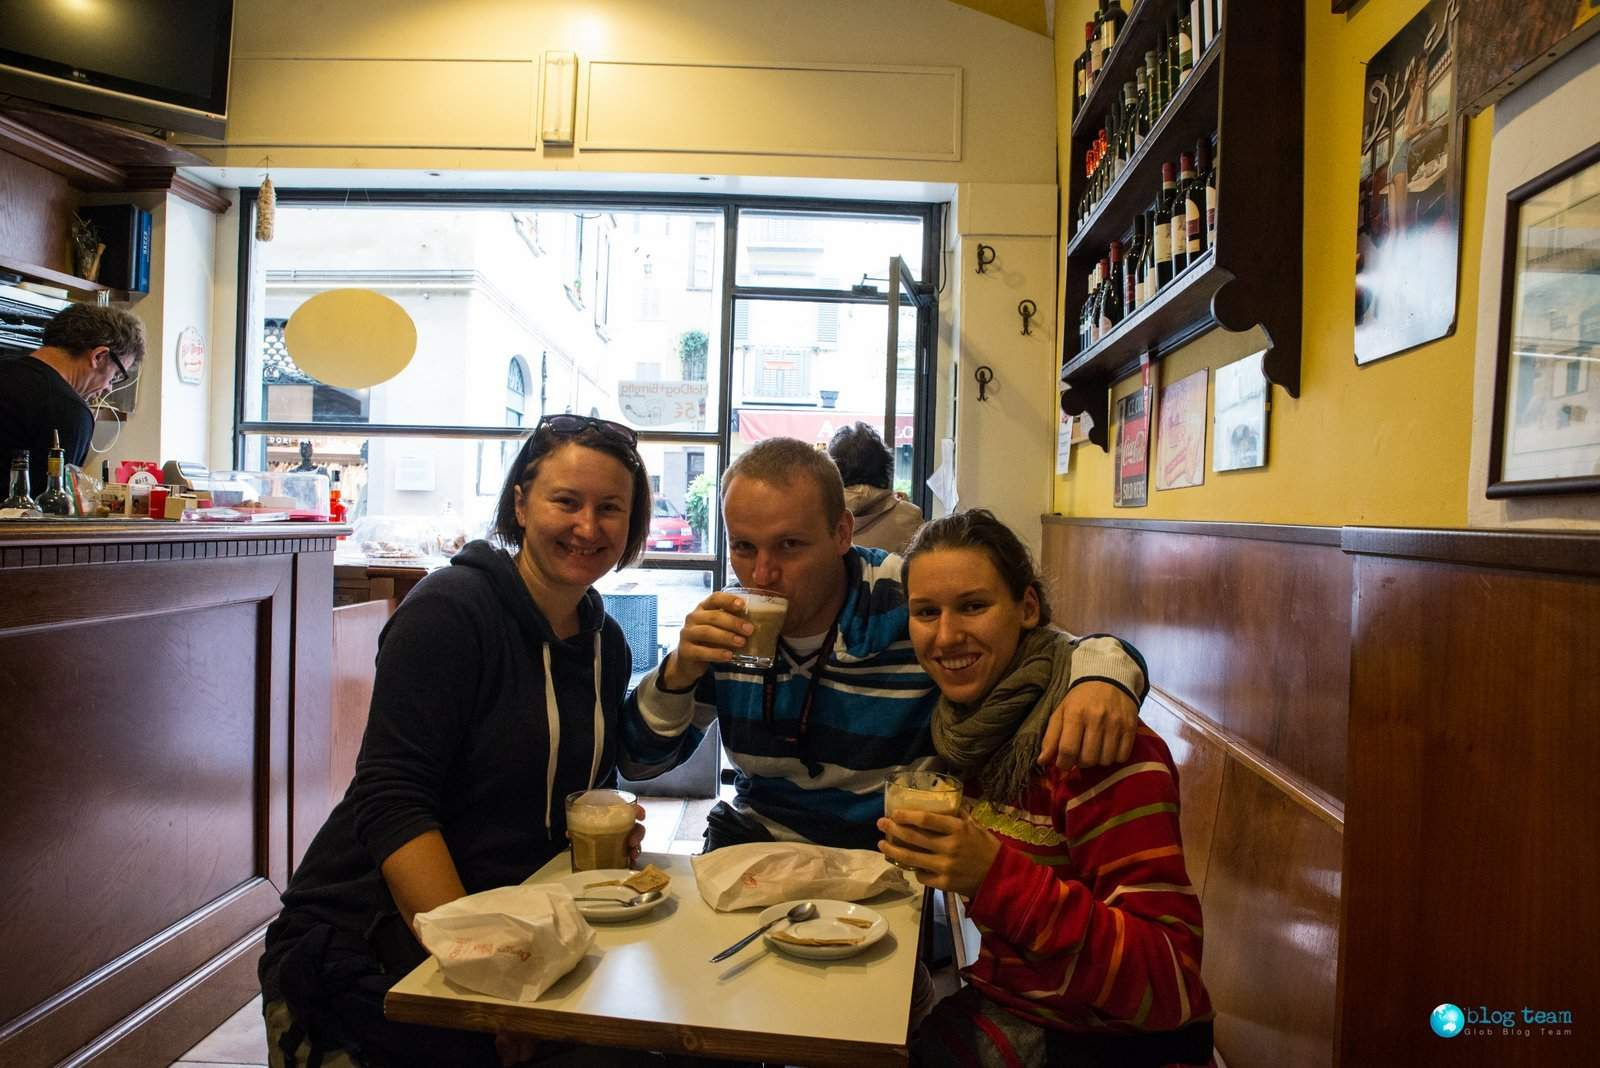 Bergamo Cafe - Kawiarnia w Bergamo